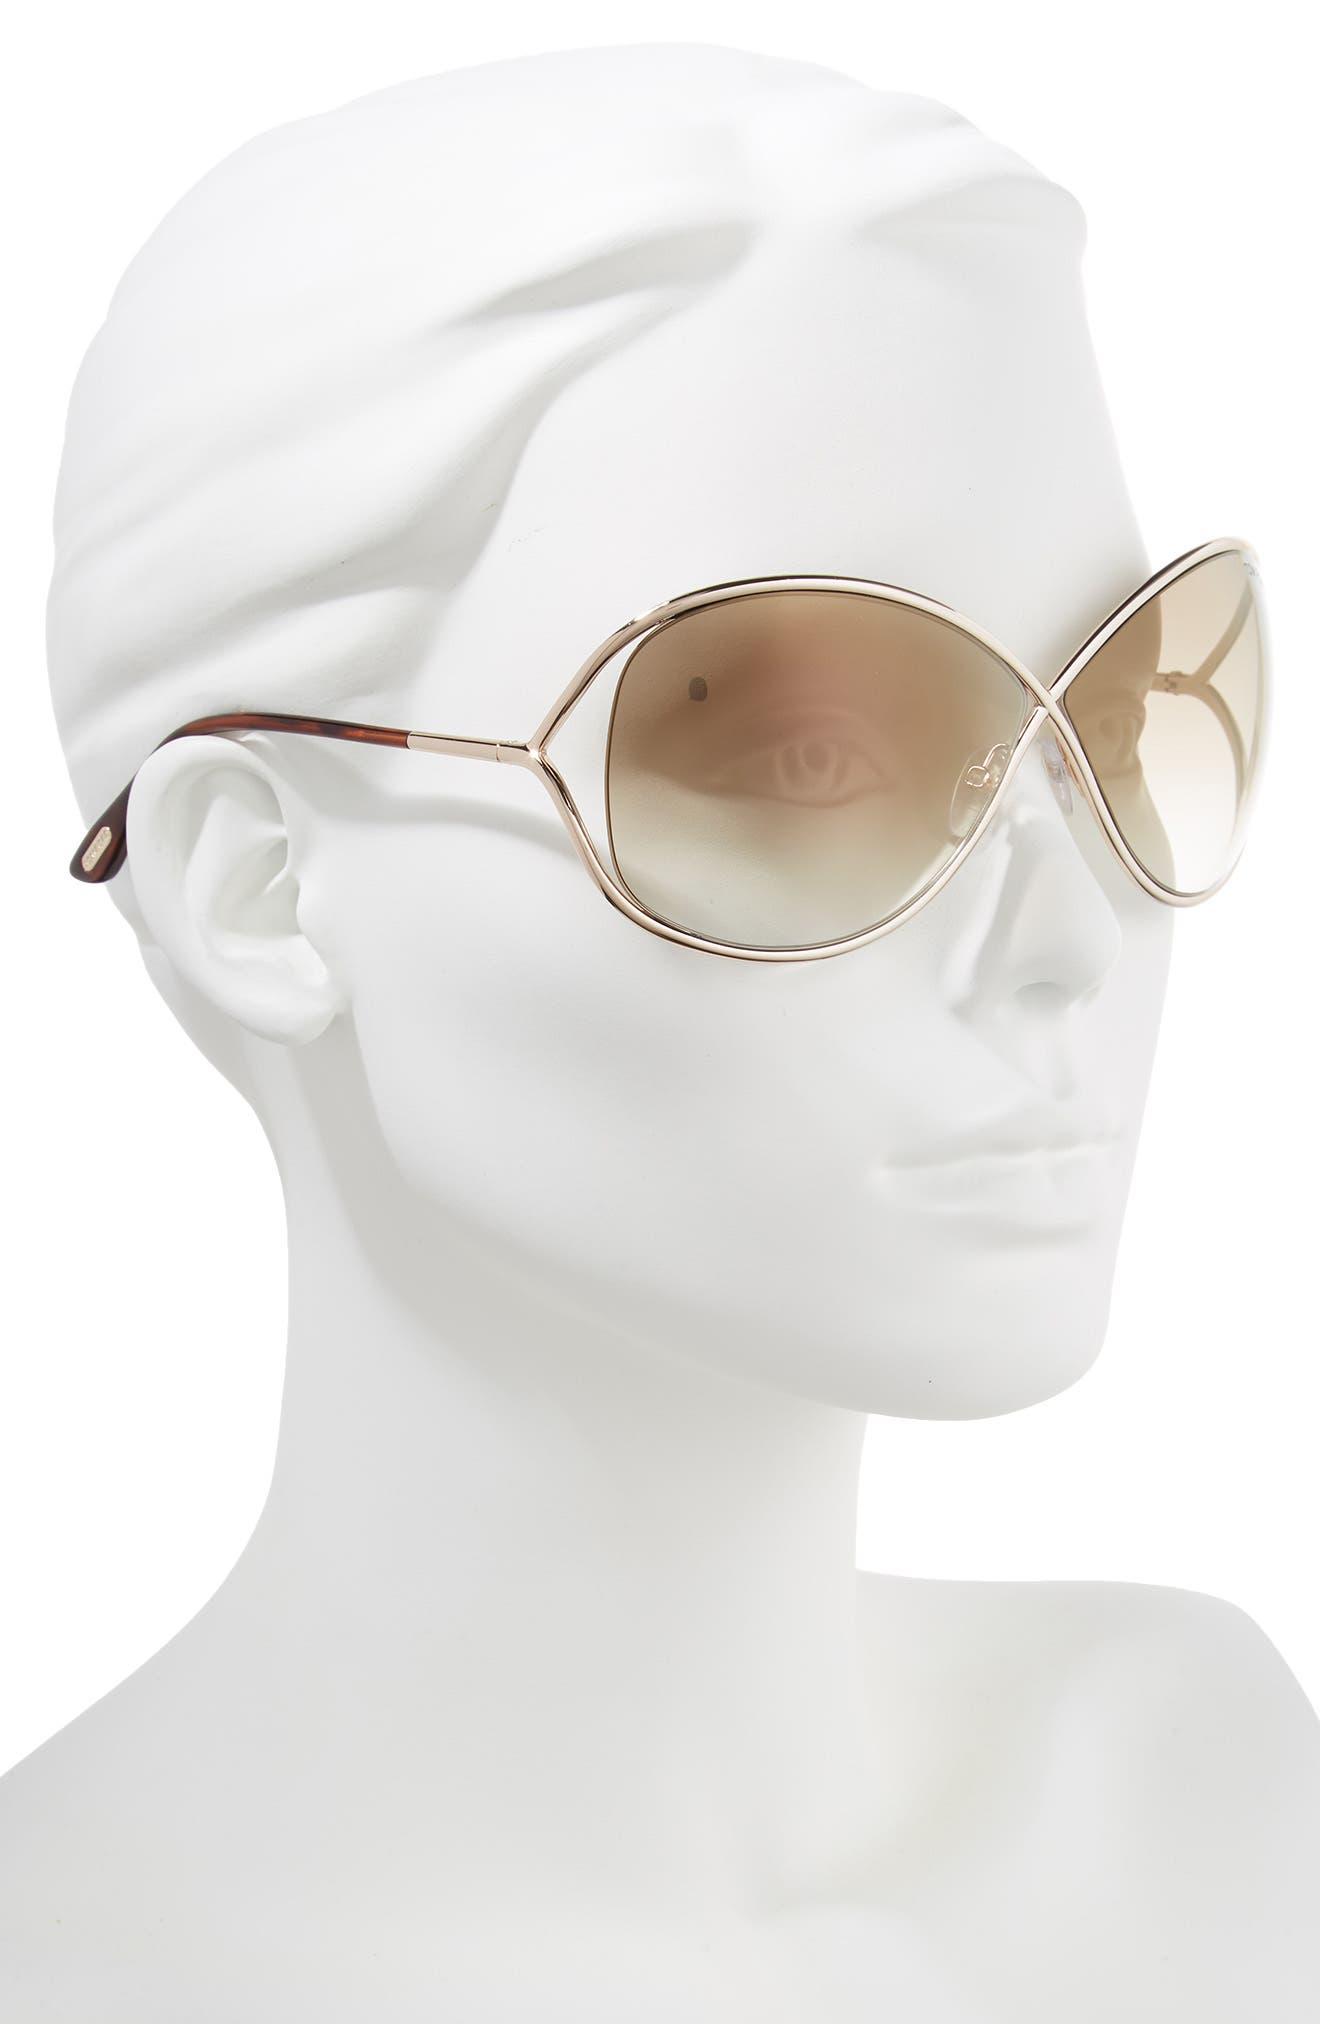 Miranda 68mm Open Temple Oversize Metal Sunglasses,                             Alternate thumbnail 2, color,                             Shiny Rose Gold/ Brown